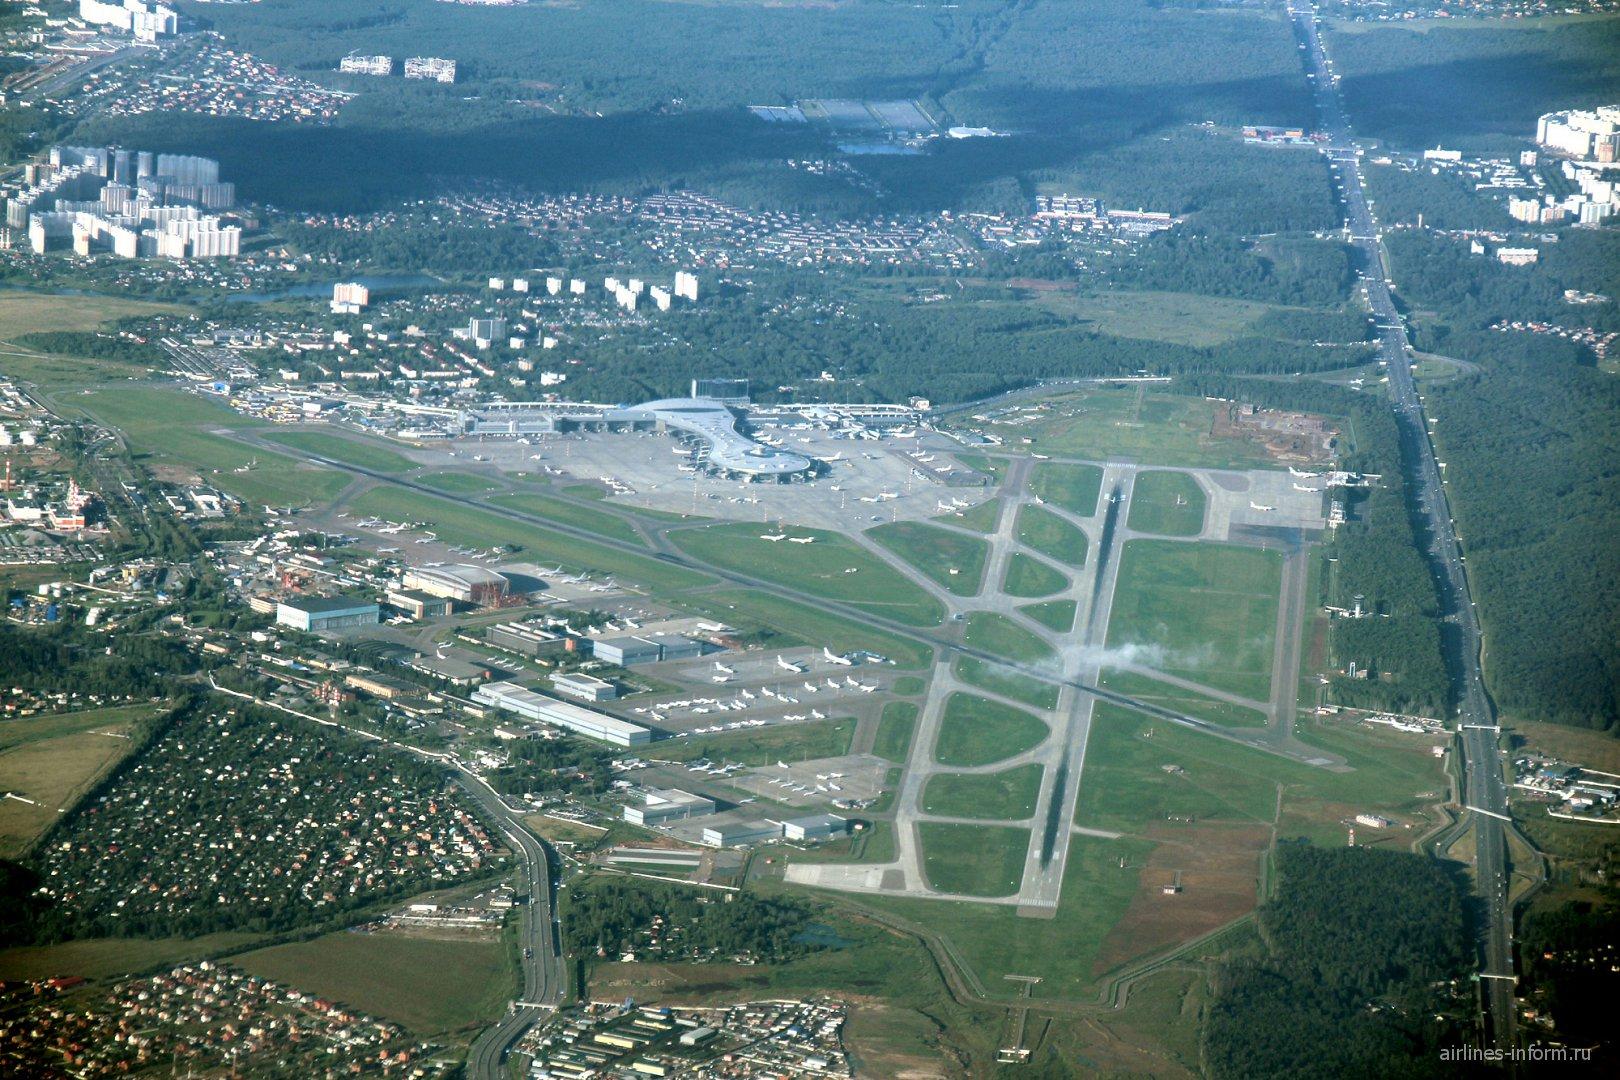 Аэропорт Москва Внуково